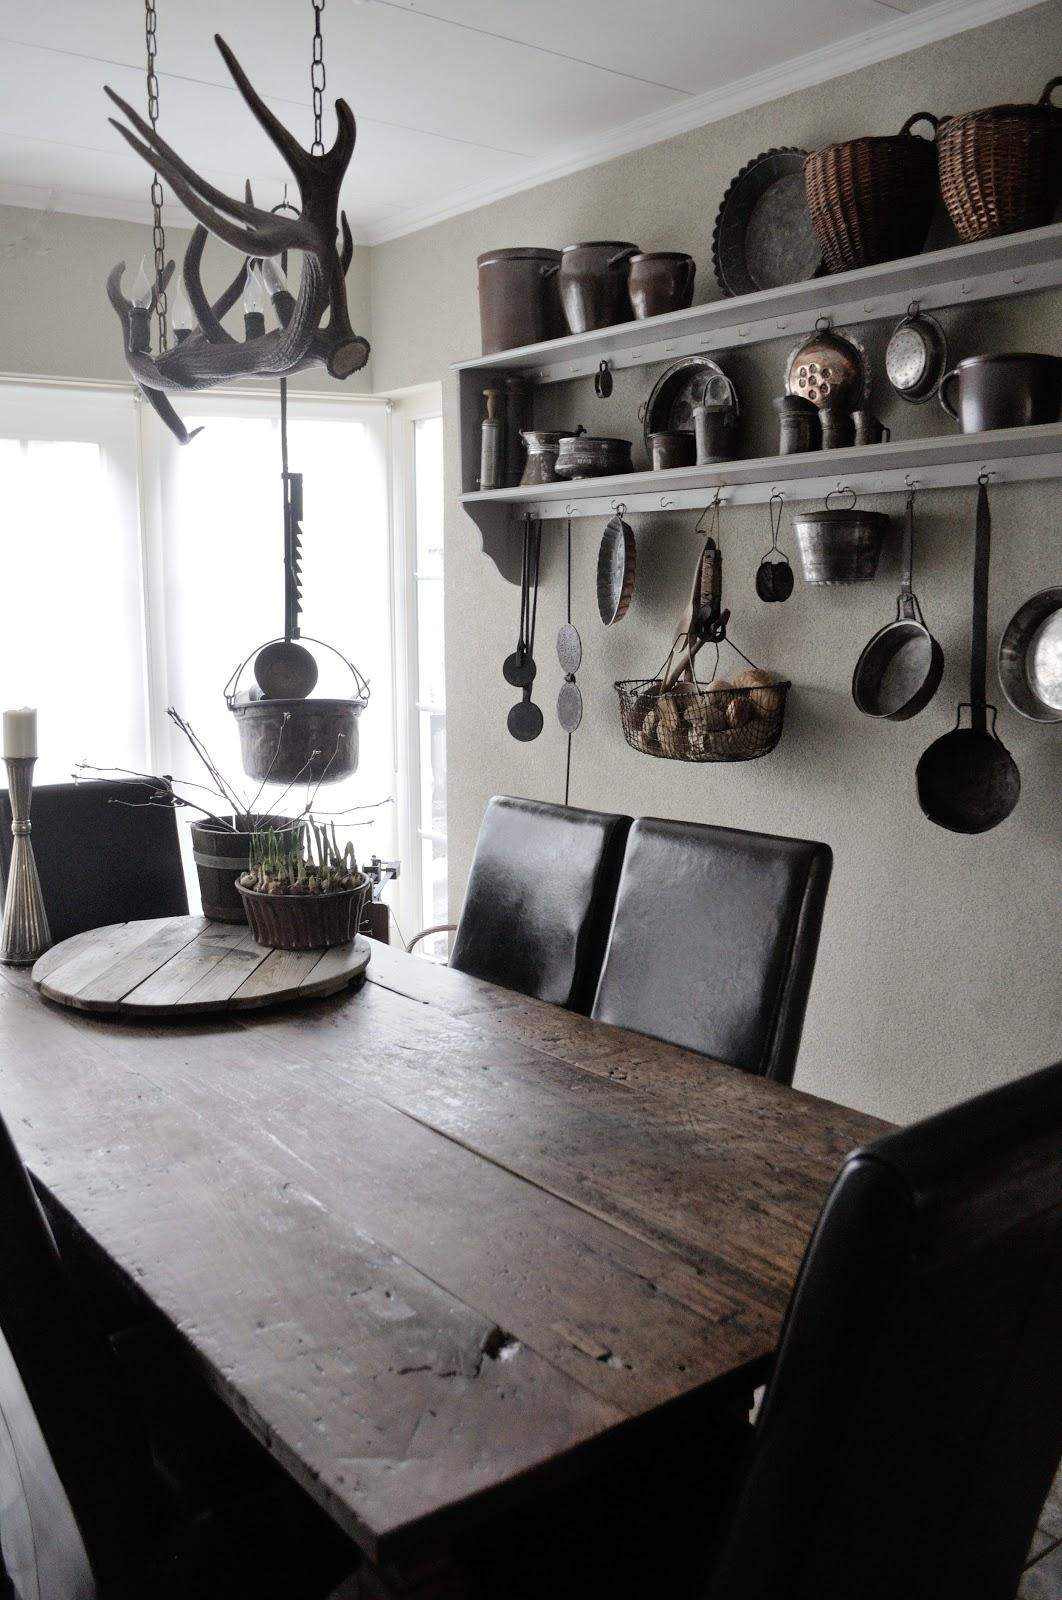 Keukenrek Staand : Kom Achterom: februari 2014